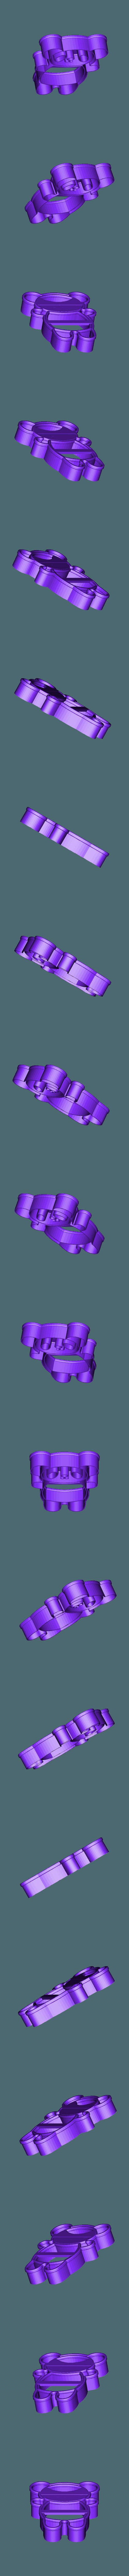 Overview1.stl Download free STL file Full Panda Cookie Cutter • 3D printer object, kasinatorhh